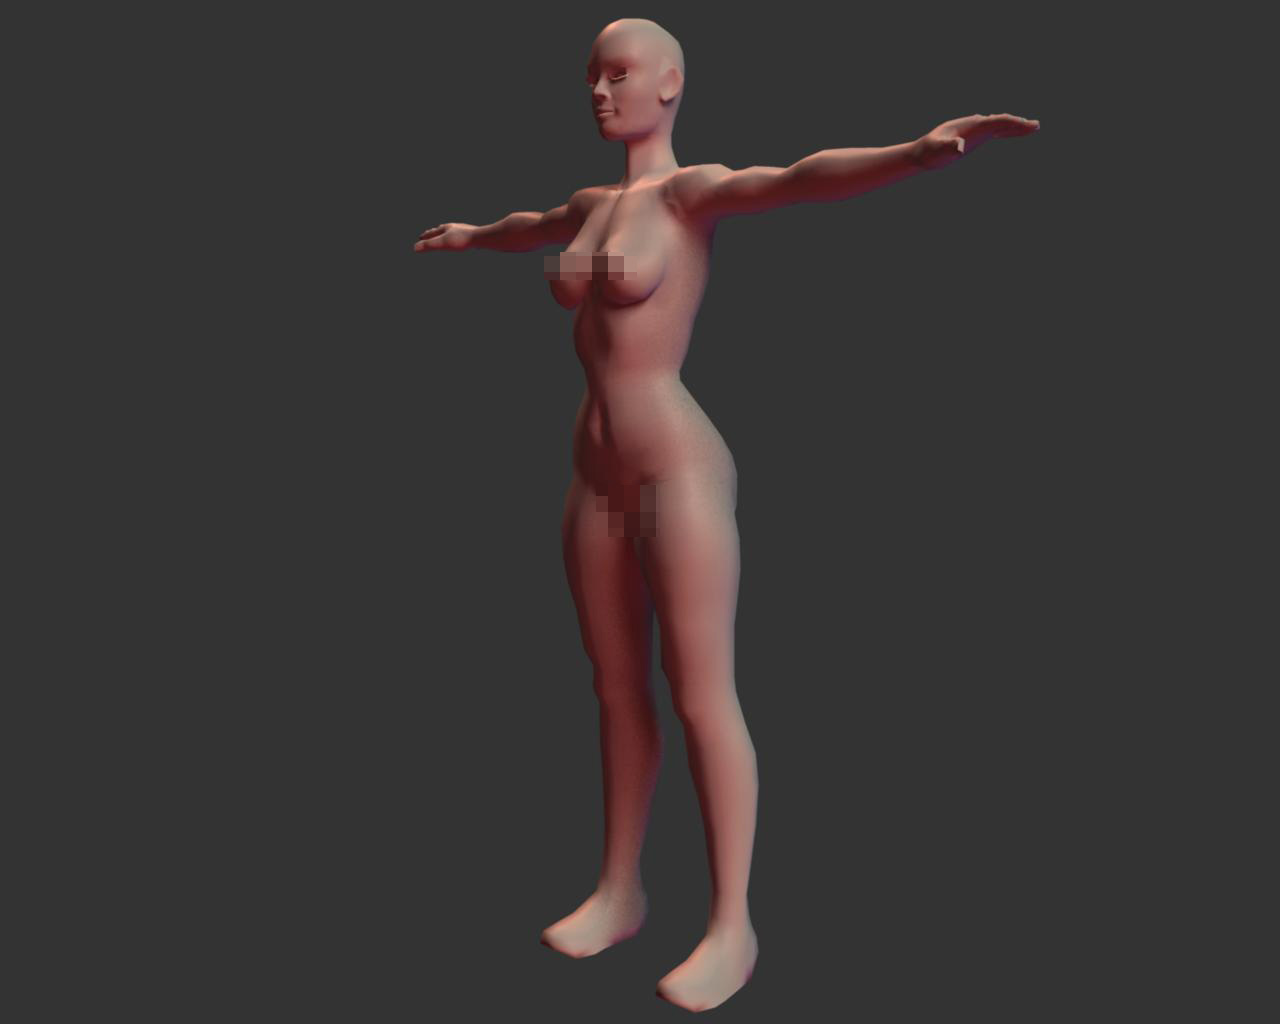 Indian naked image naked images